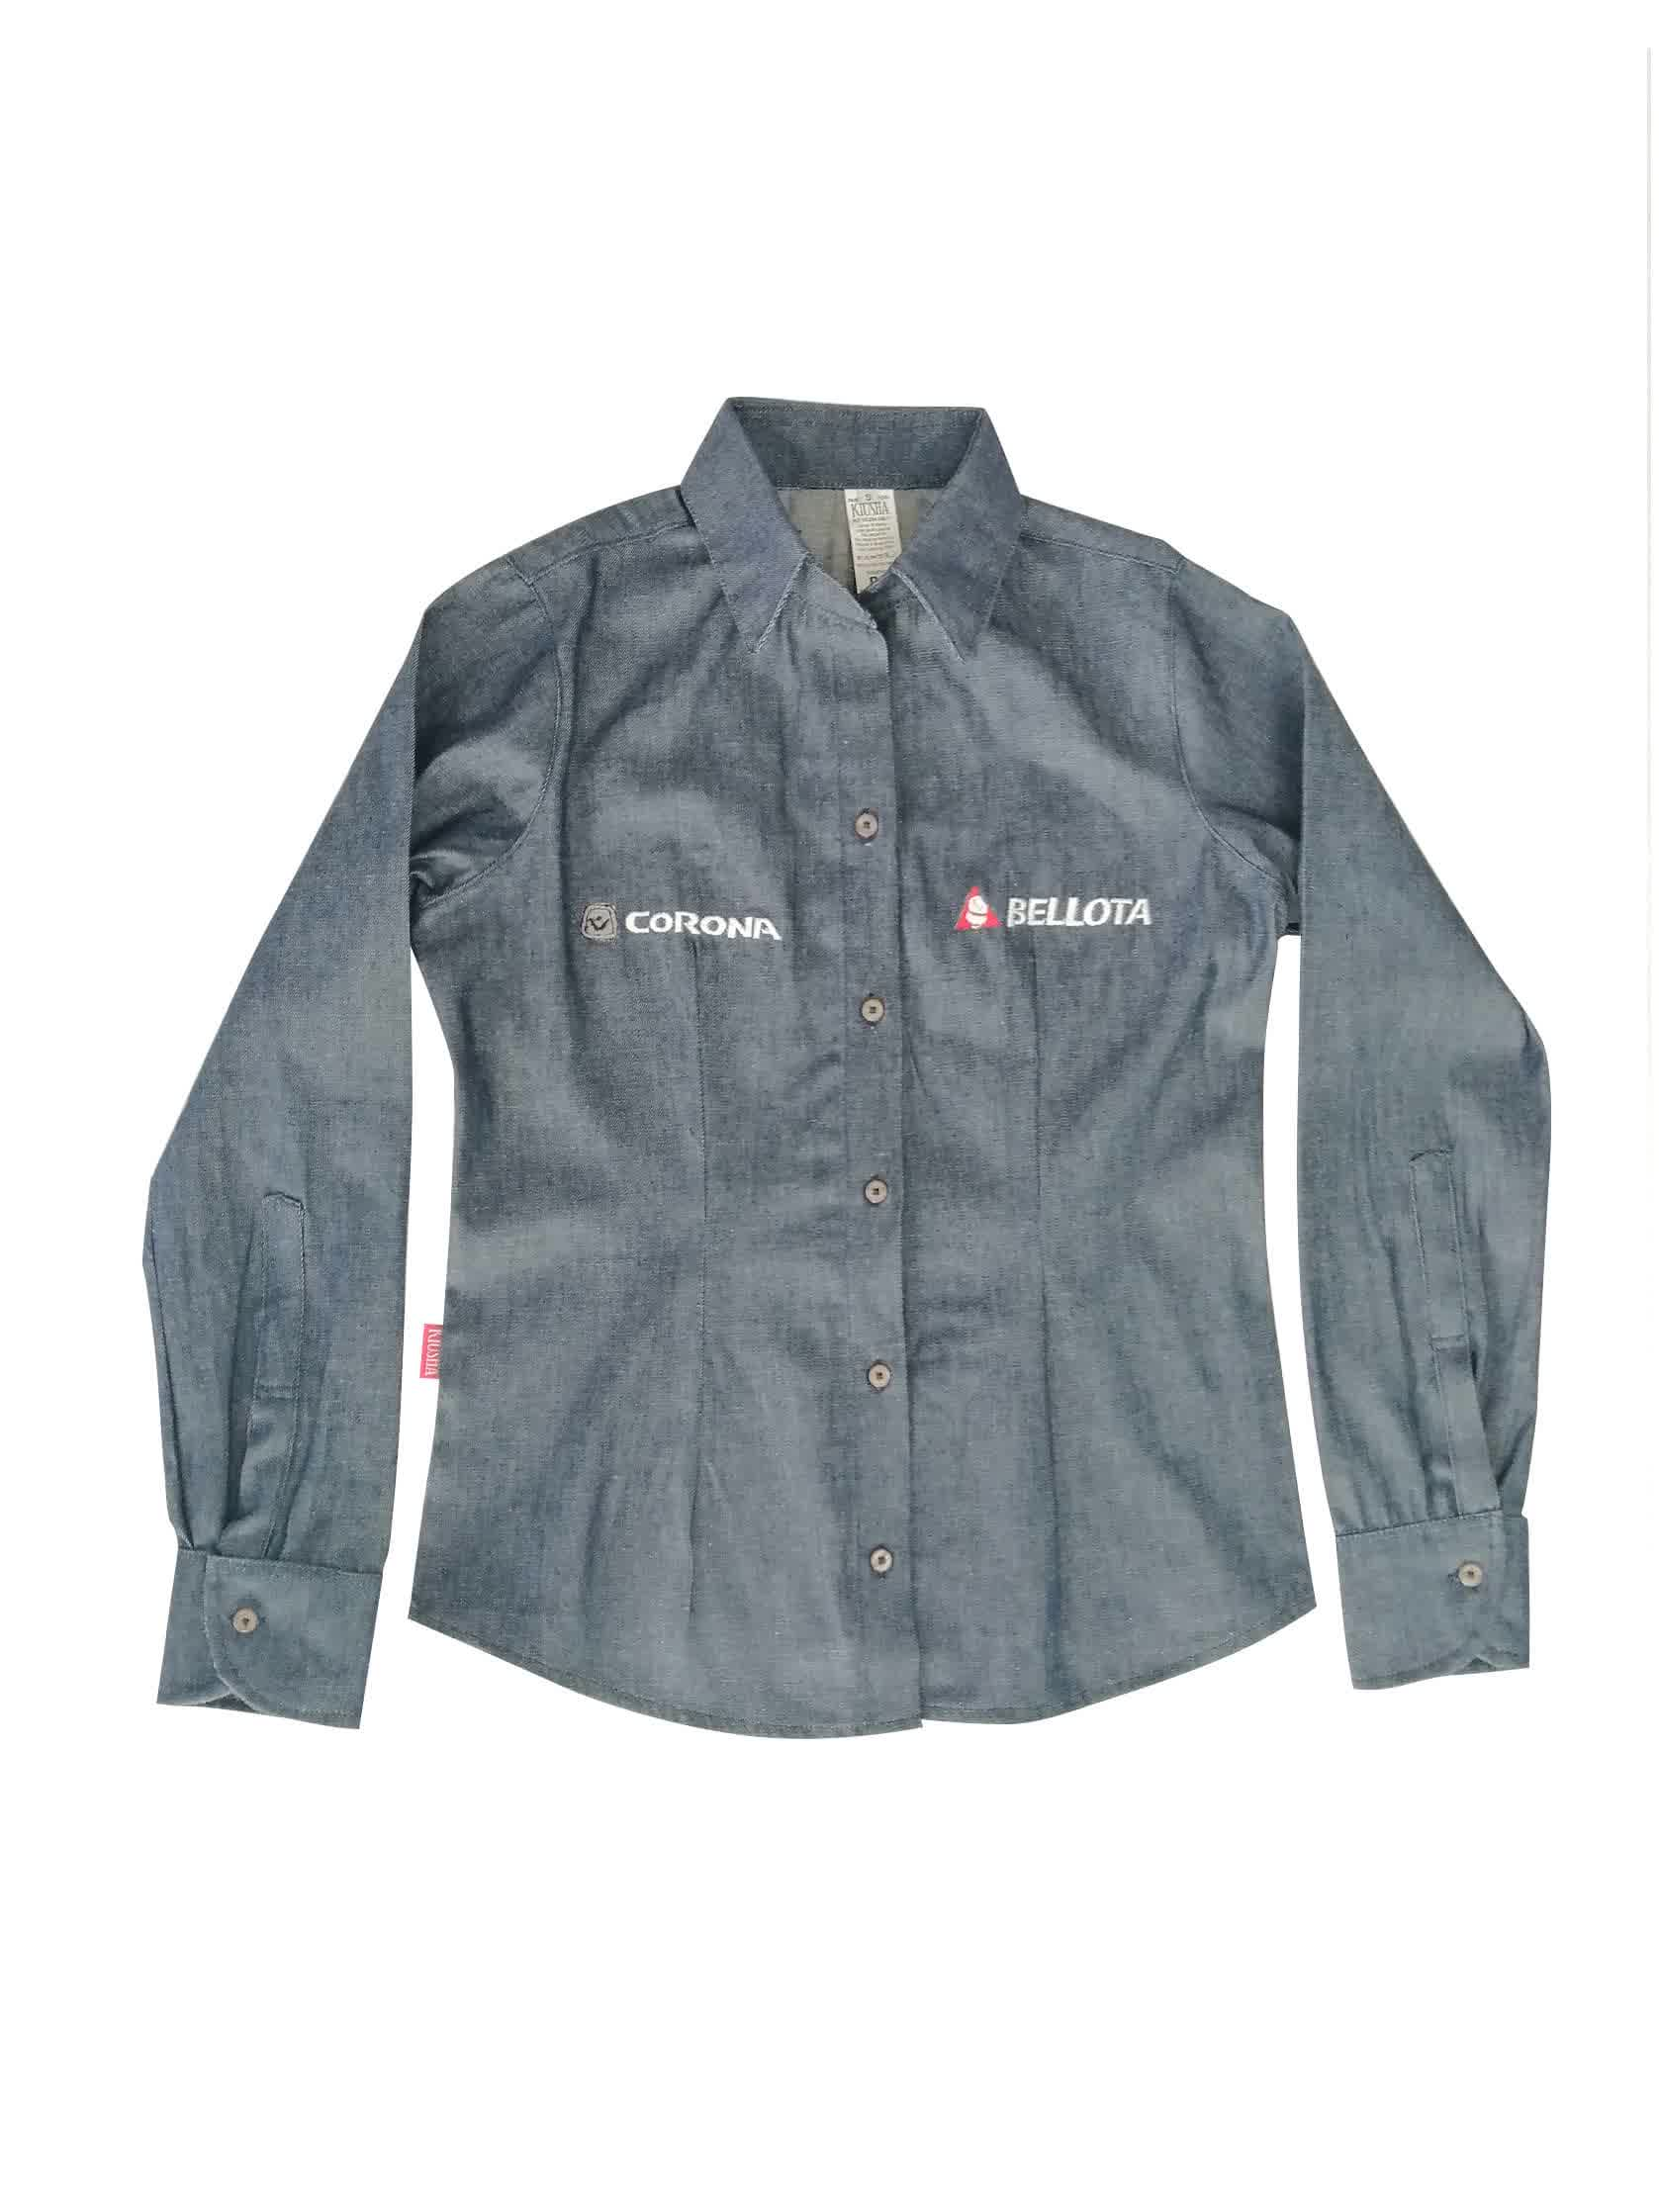 camisas para empresas